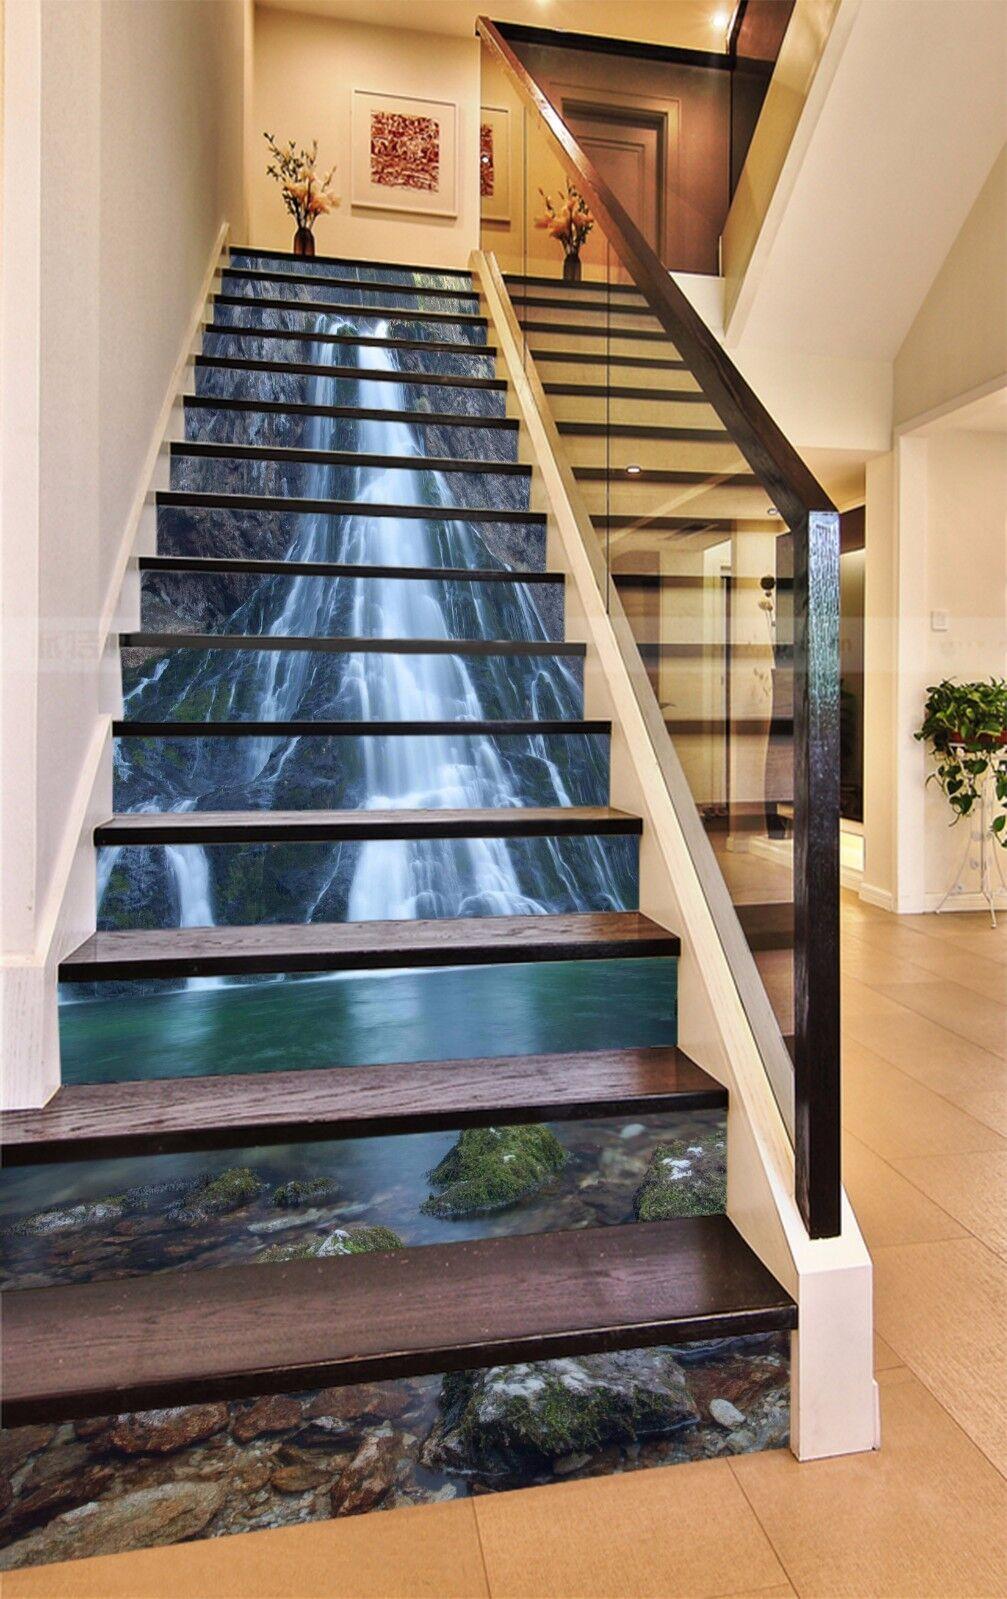 3D Falls River 7753 Stair Risers Decoration Photo Mural Vinyl Decal Wallpaper AU